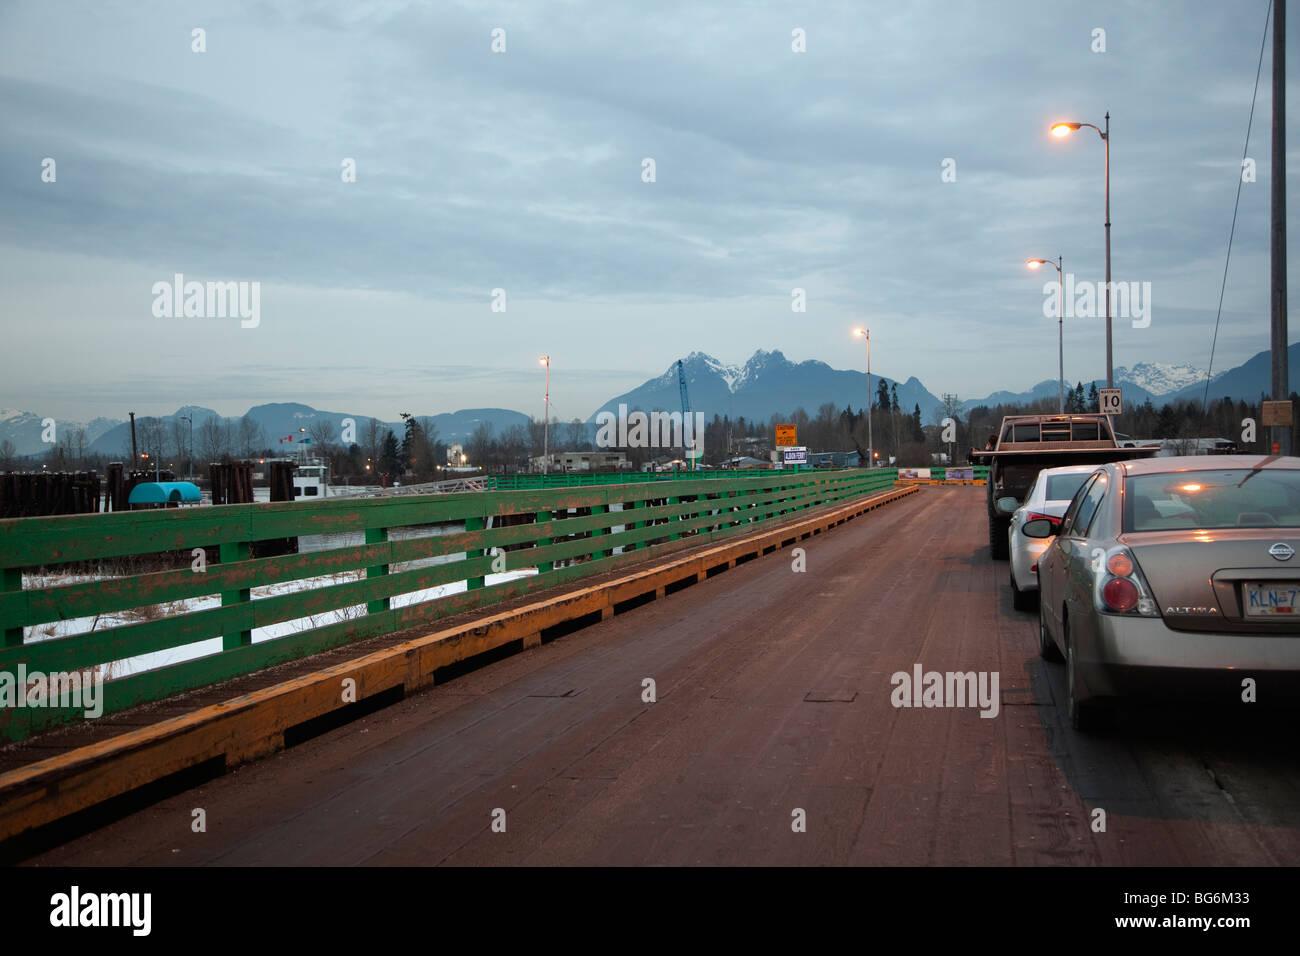 Une file de voitures attendant le traversier Albion, Fraser River, Fort Langley, BC, Canada Photo Stock